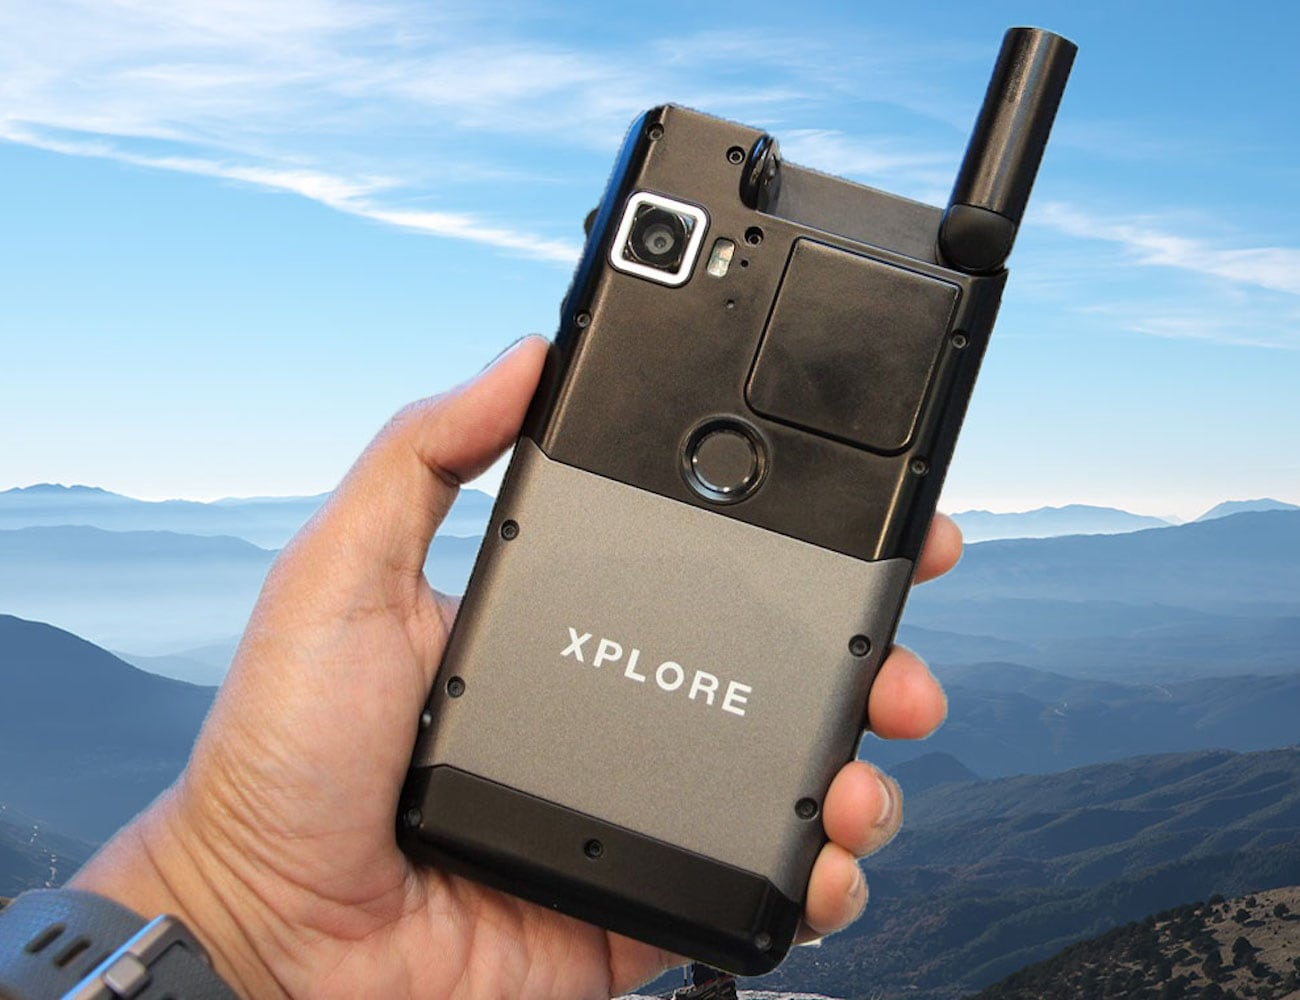 Xplore X7 Rugged Android Satellite Smartphone